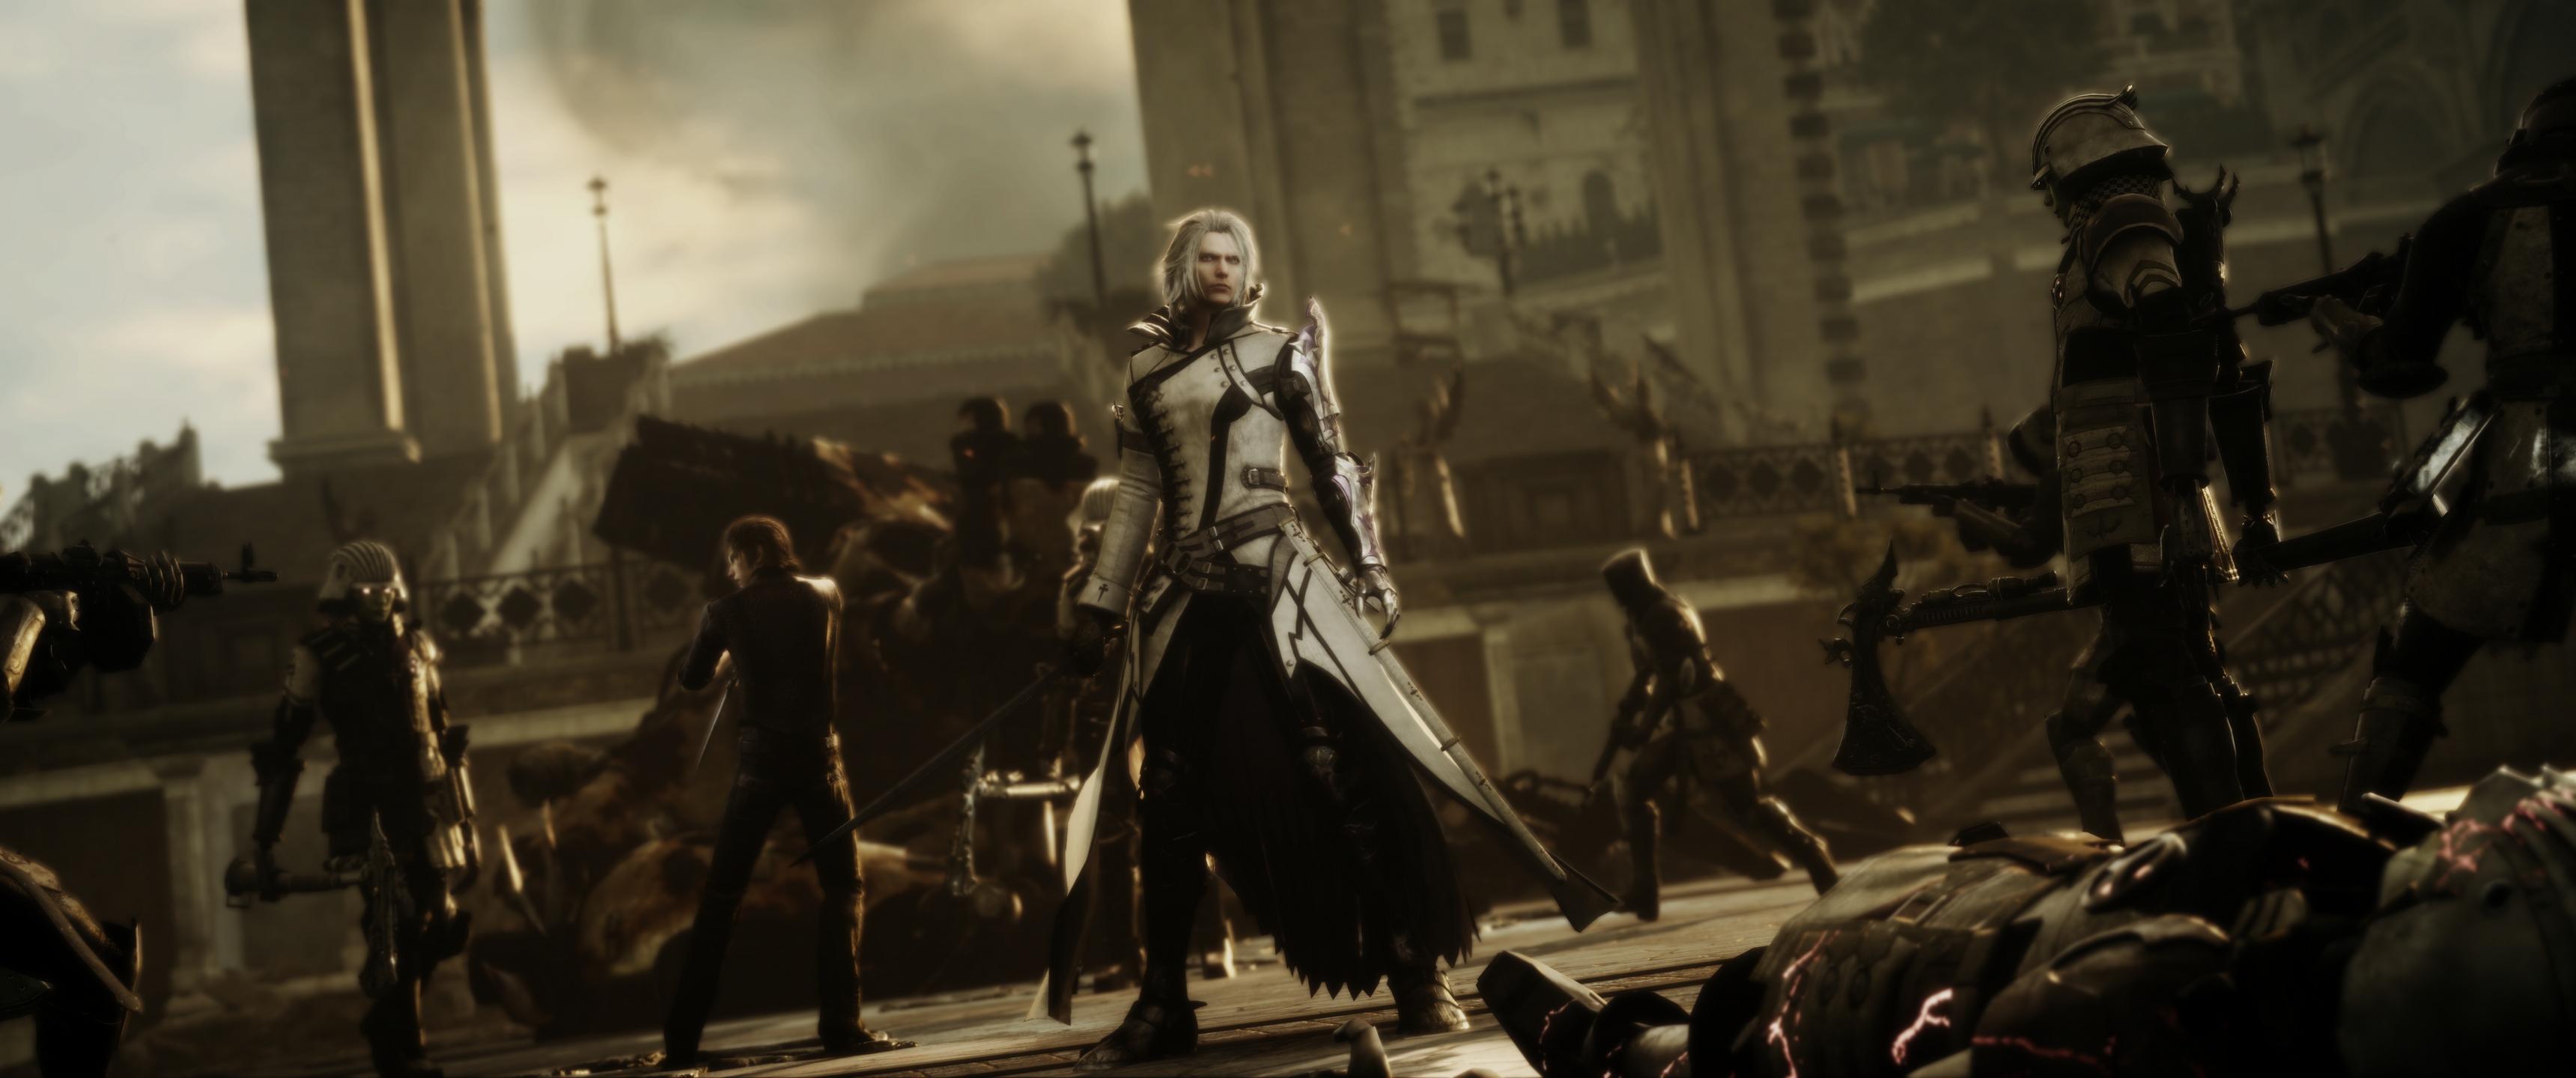 2560x1080 Final Fantasy Xv Artwork 2560x1080 Resolution Hd: Final Fantasy Xv 4k, HD Games, 4k Wallpapers, Images